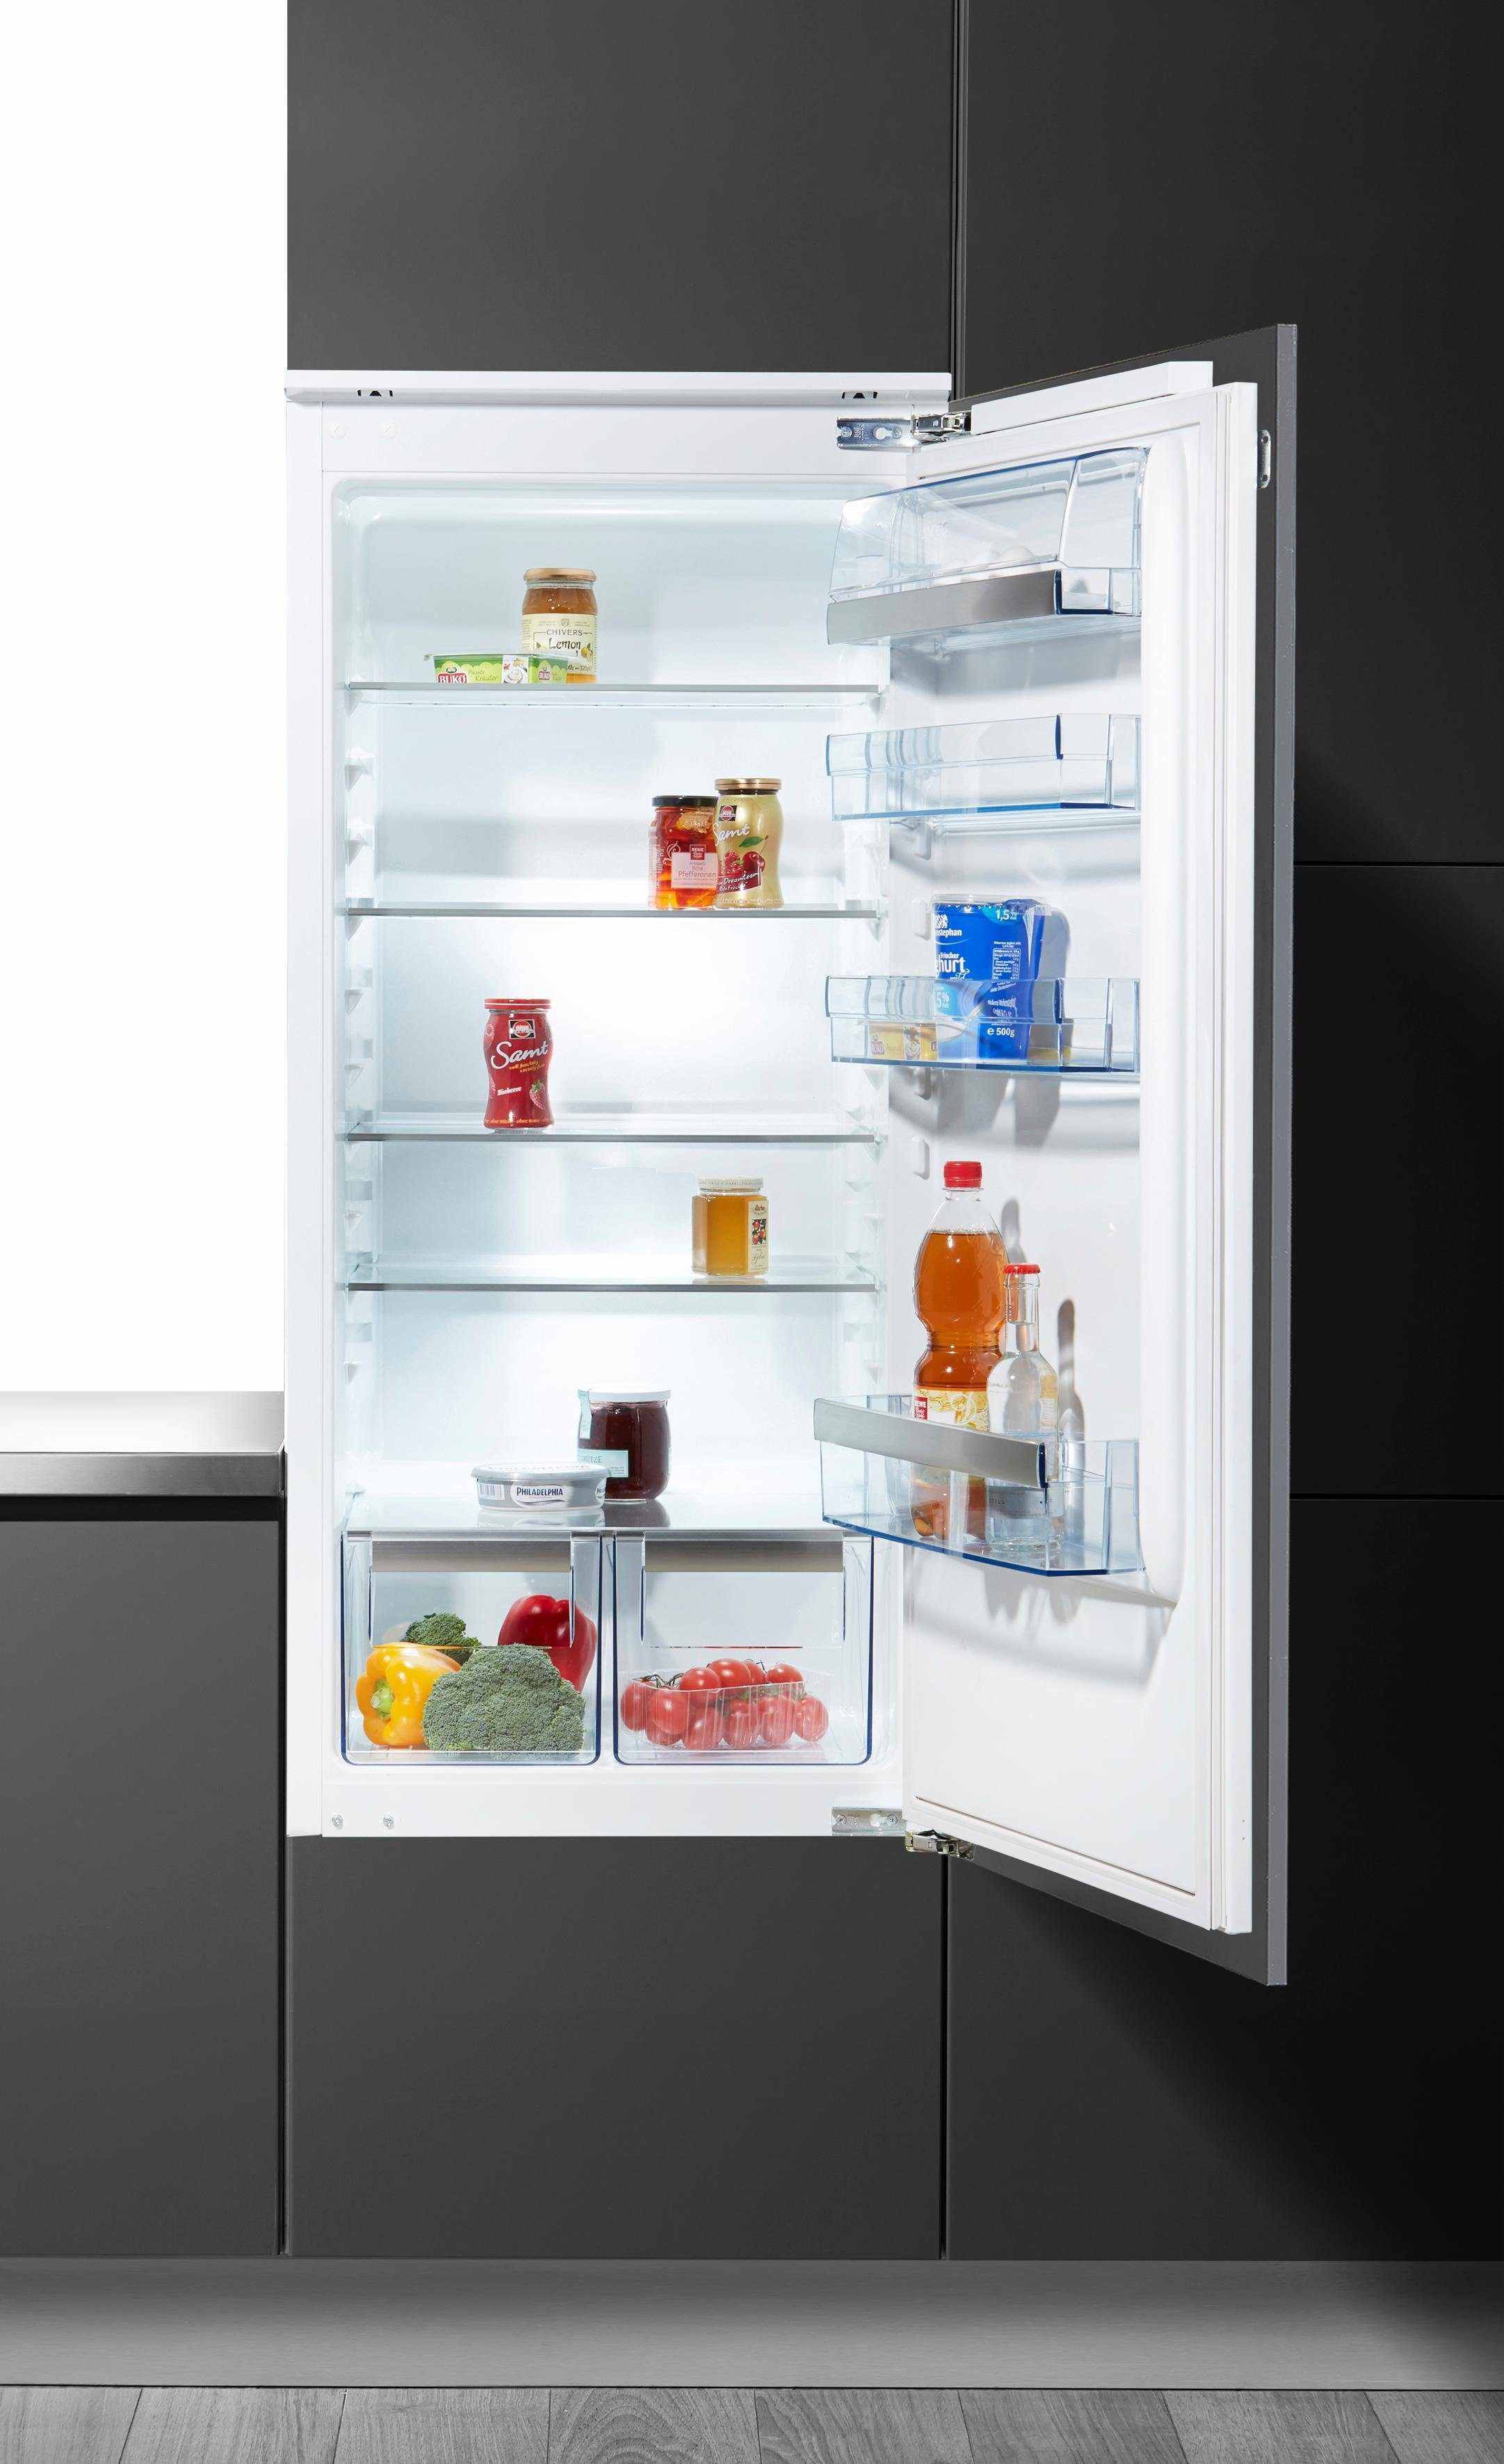 AEG Kühlschrank integrierbar SANTO / SKS51200F2, Energieklasse A+